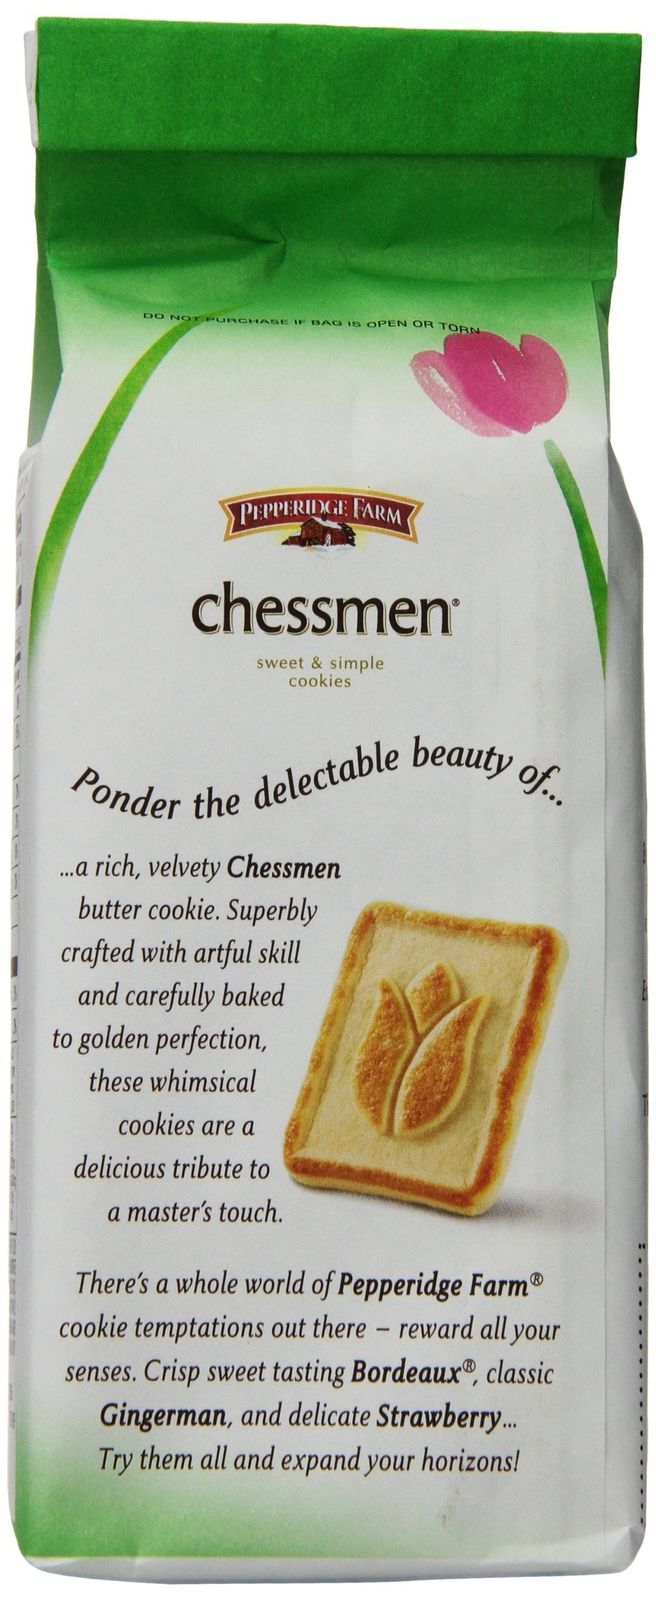 Pepperidge Farm Chessmen Cookies, 7.25 Ounce (Pack of 24) image 3